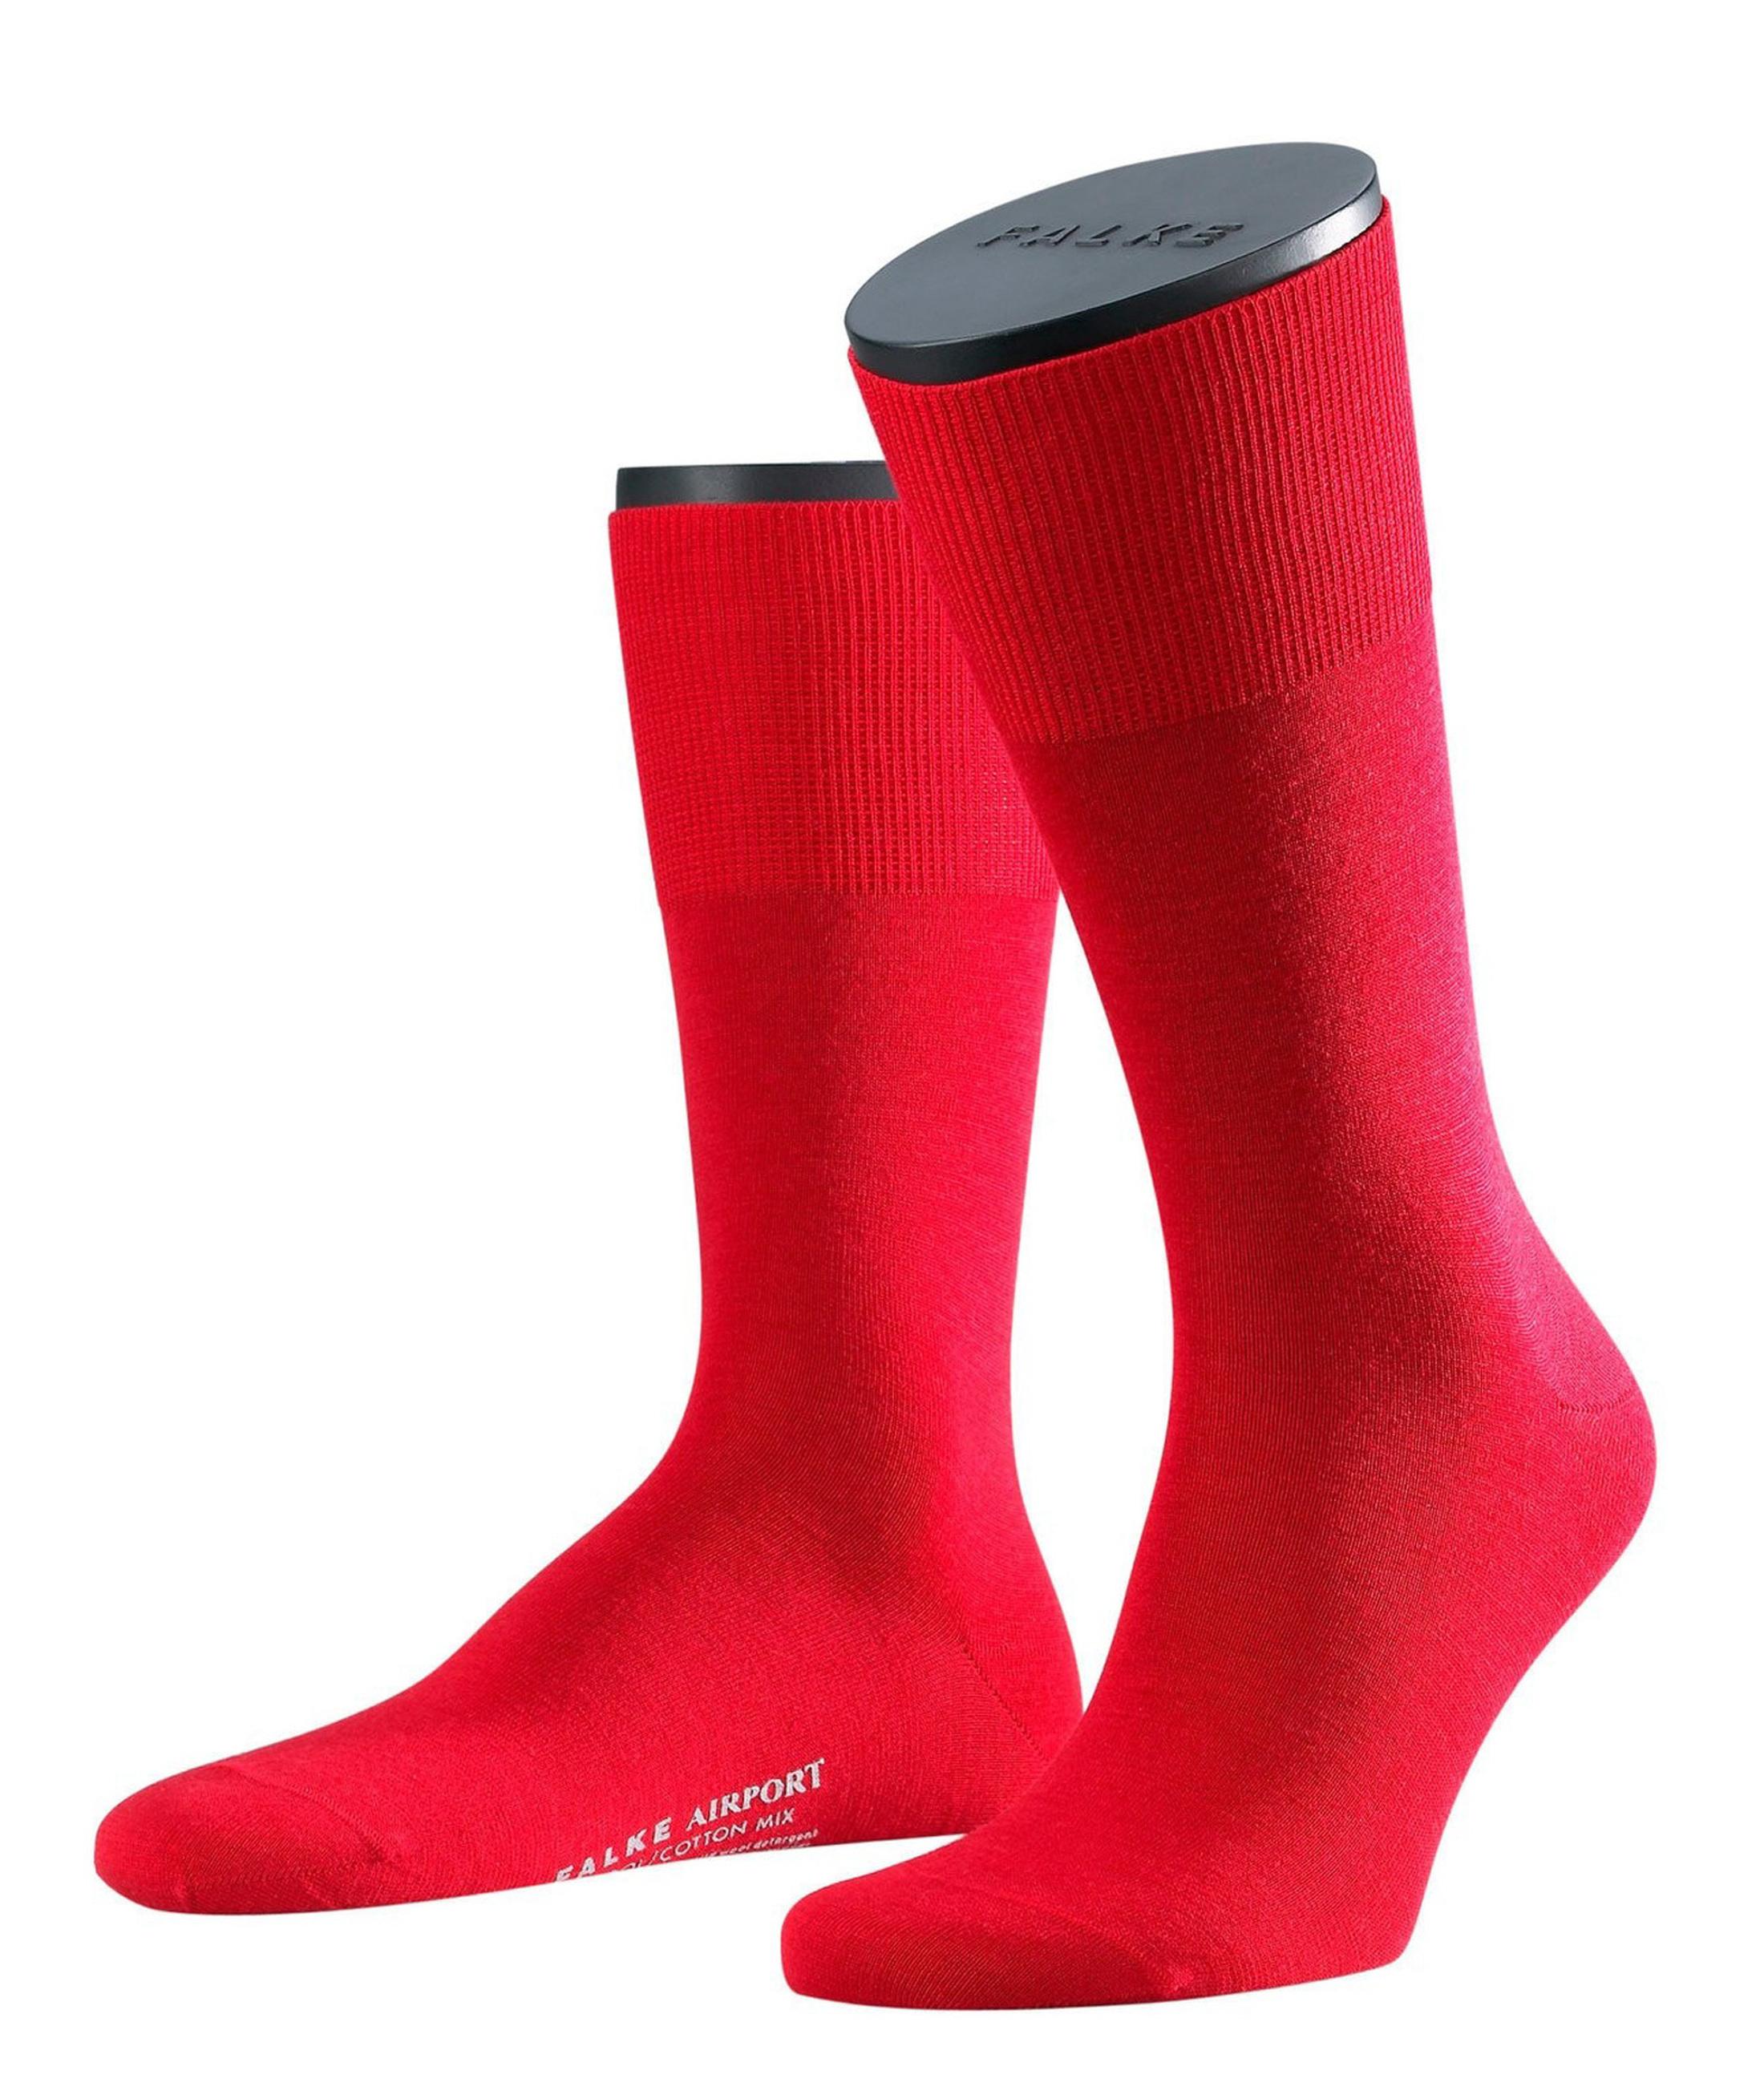 Falke Airport Socks Red 8120 foto 0